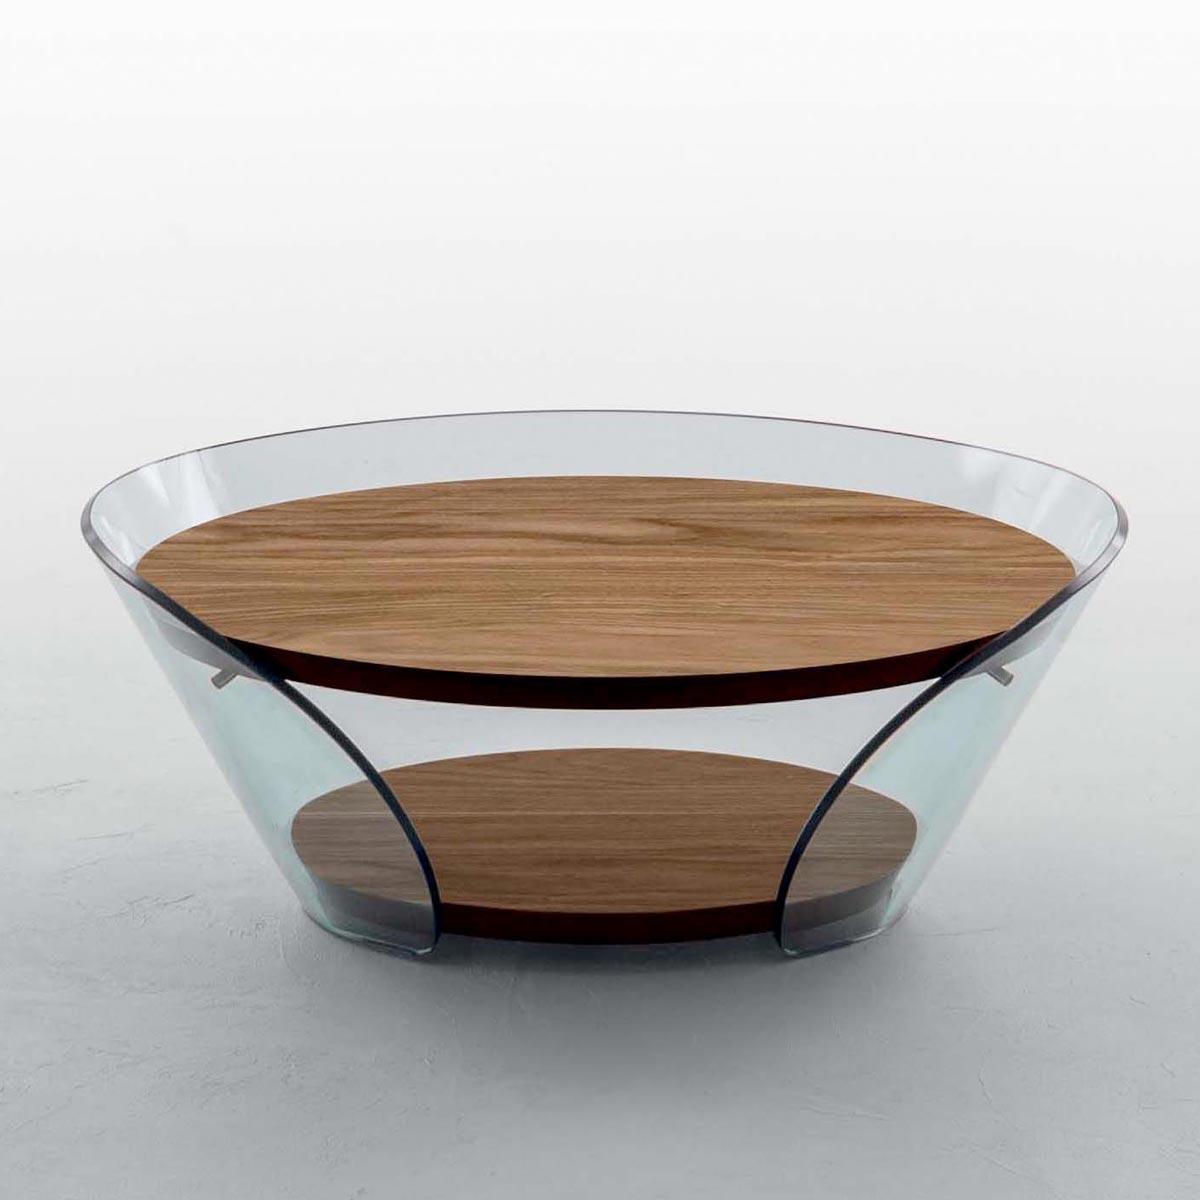 Taky Curved Glass Coffee Table: Raffaello Curved Glass Coffee Table